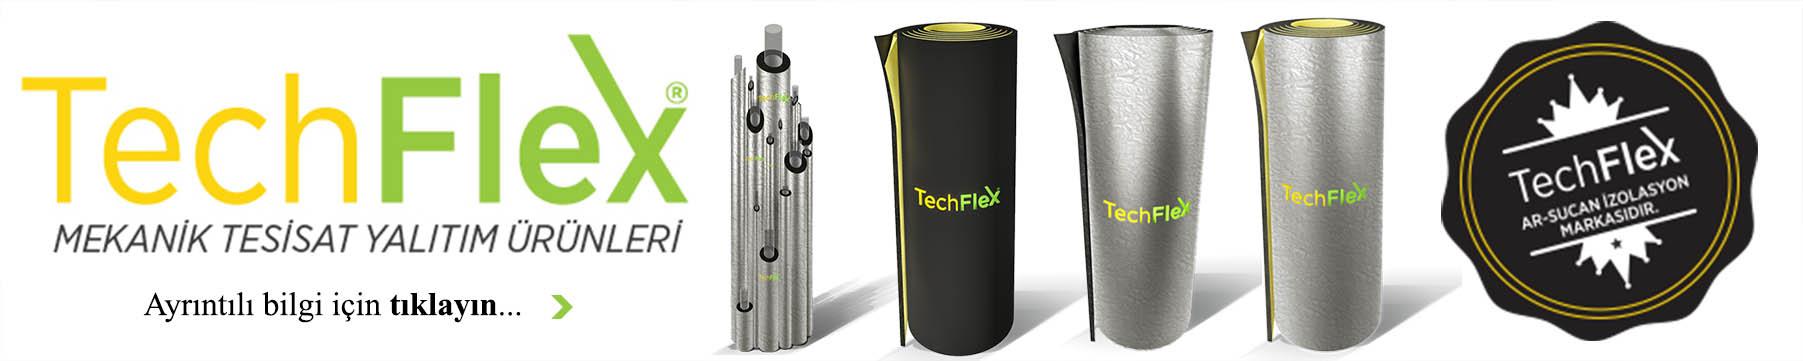 www.techflex.com.tr